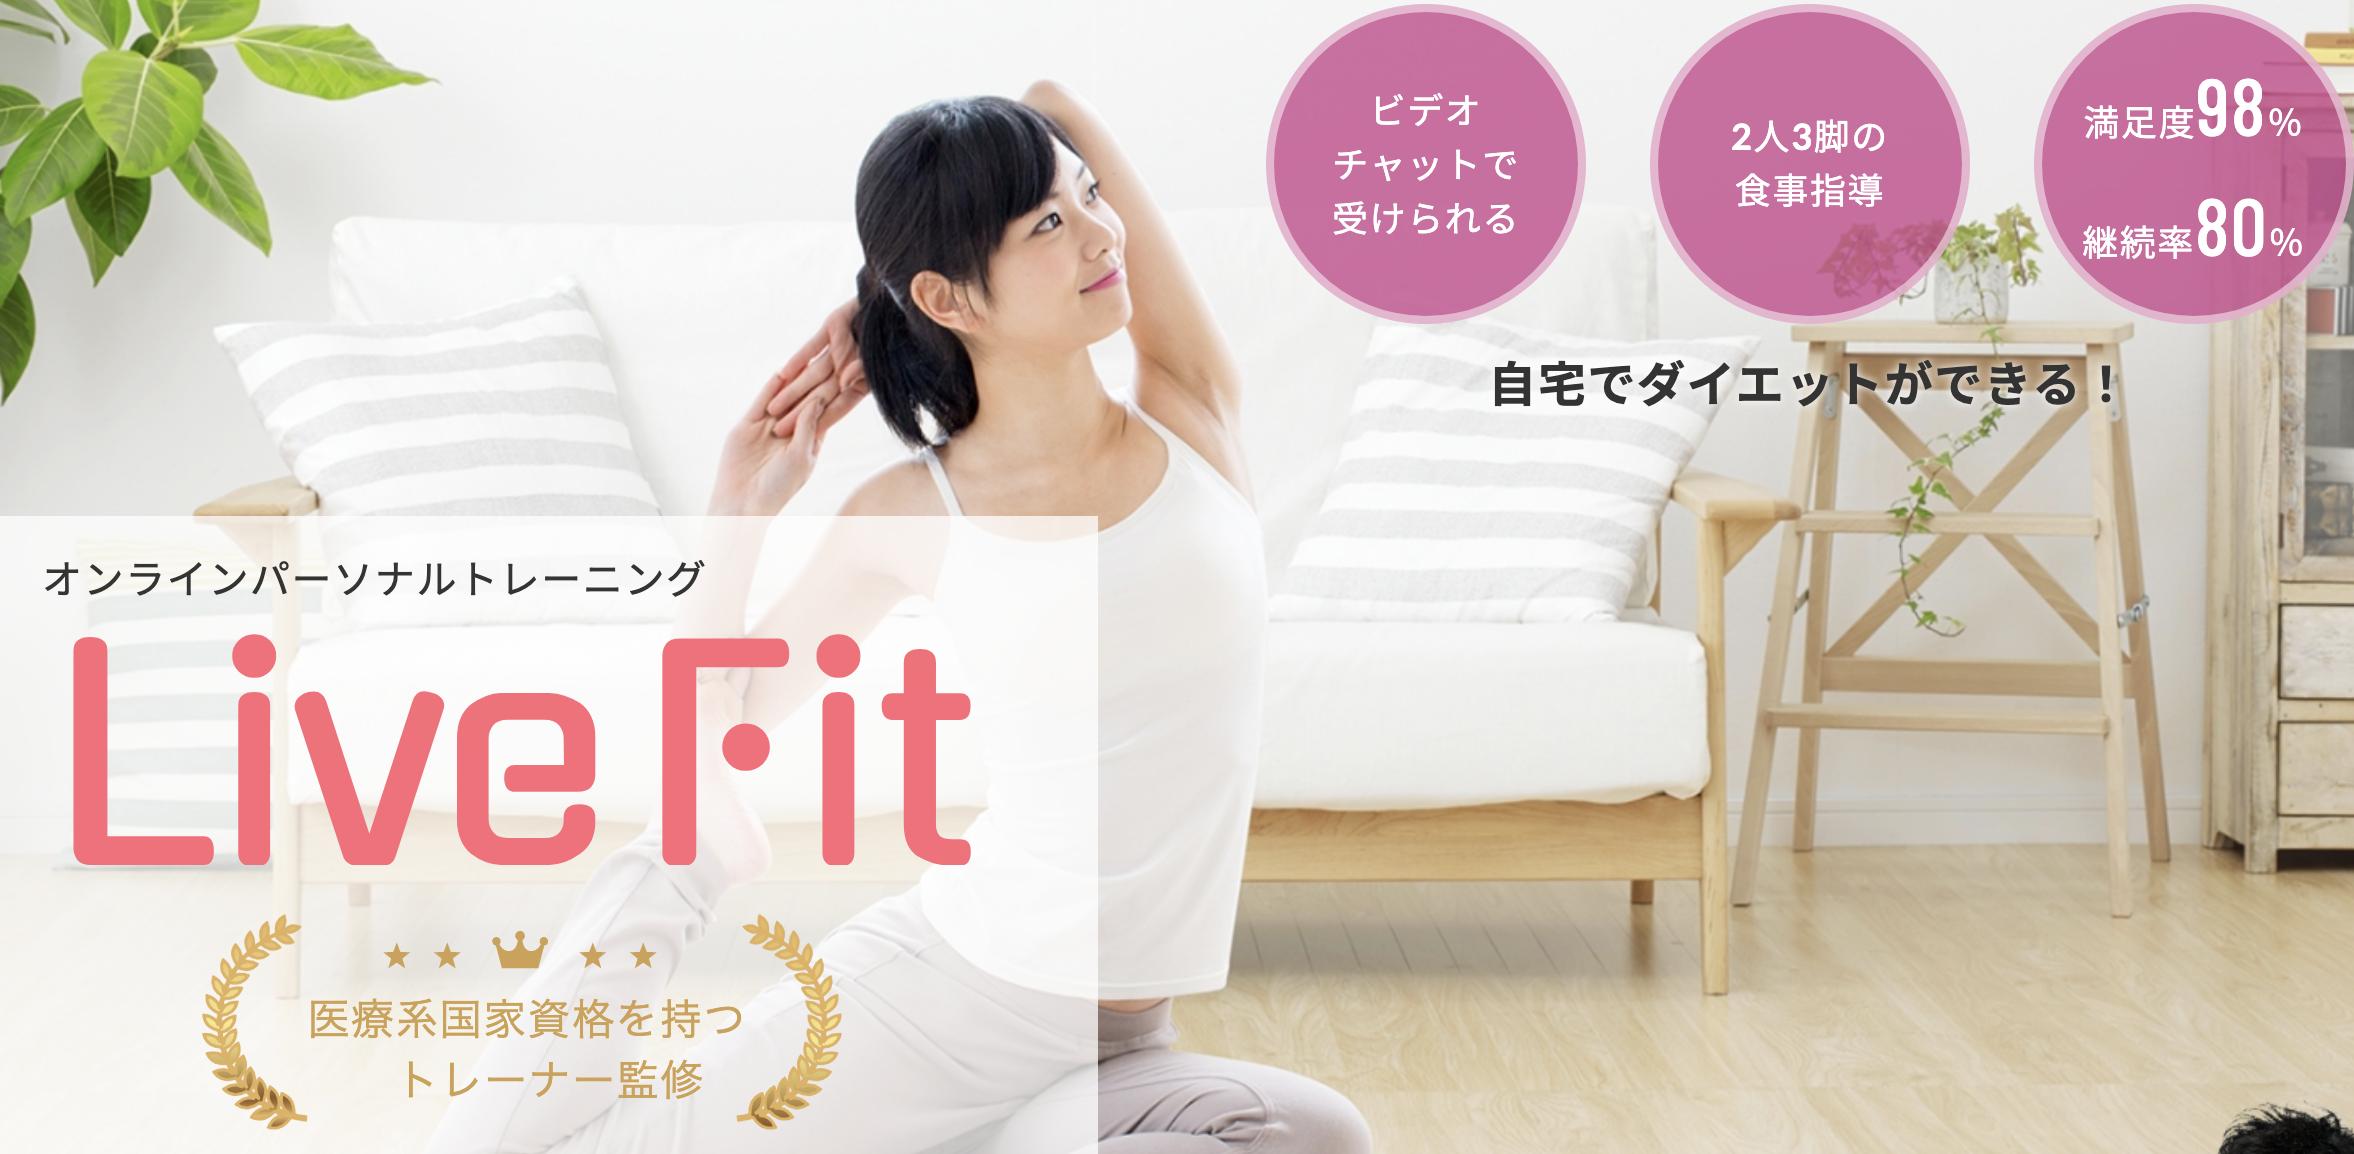 Live Fit(ライブフィット)の登録方法と流れ